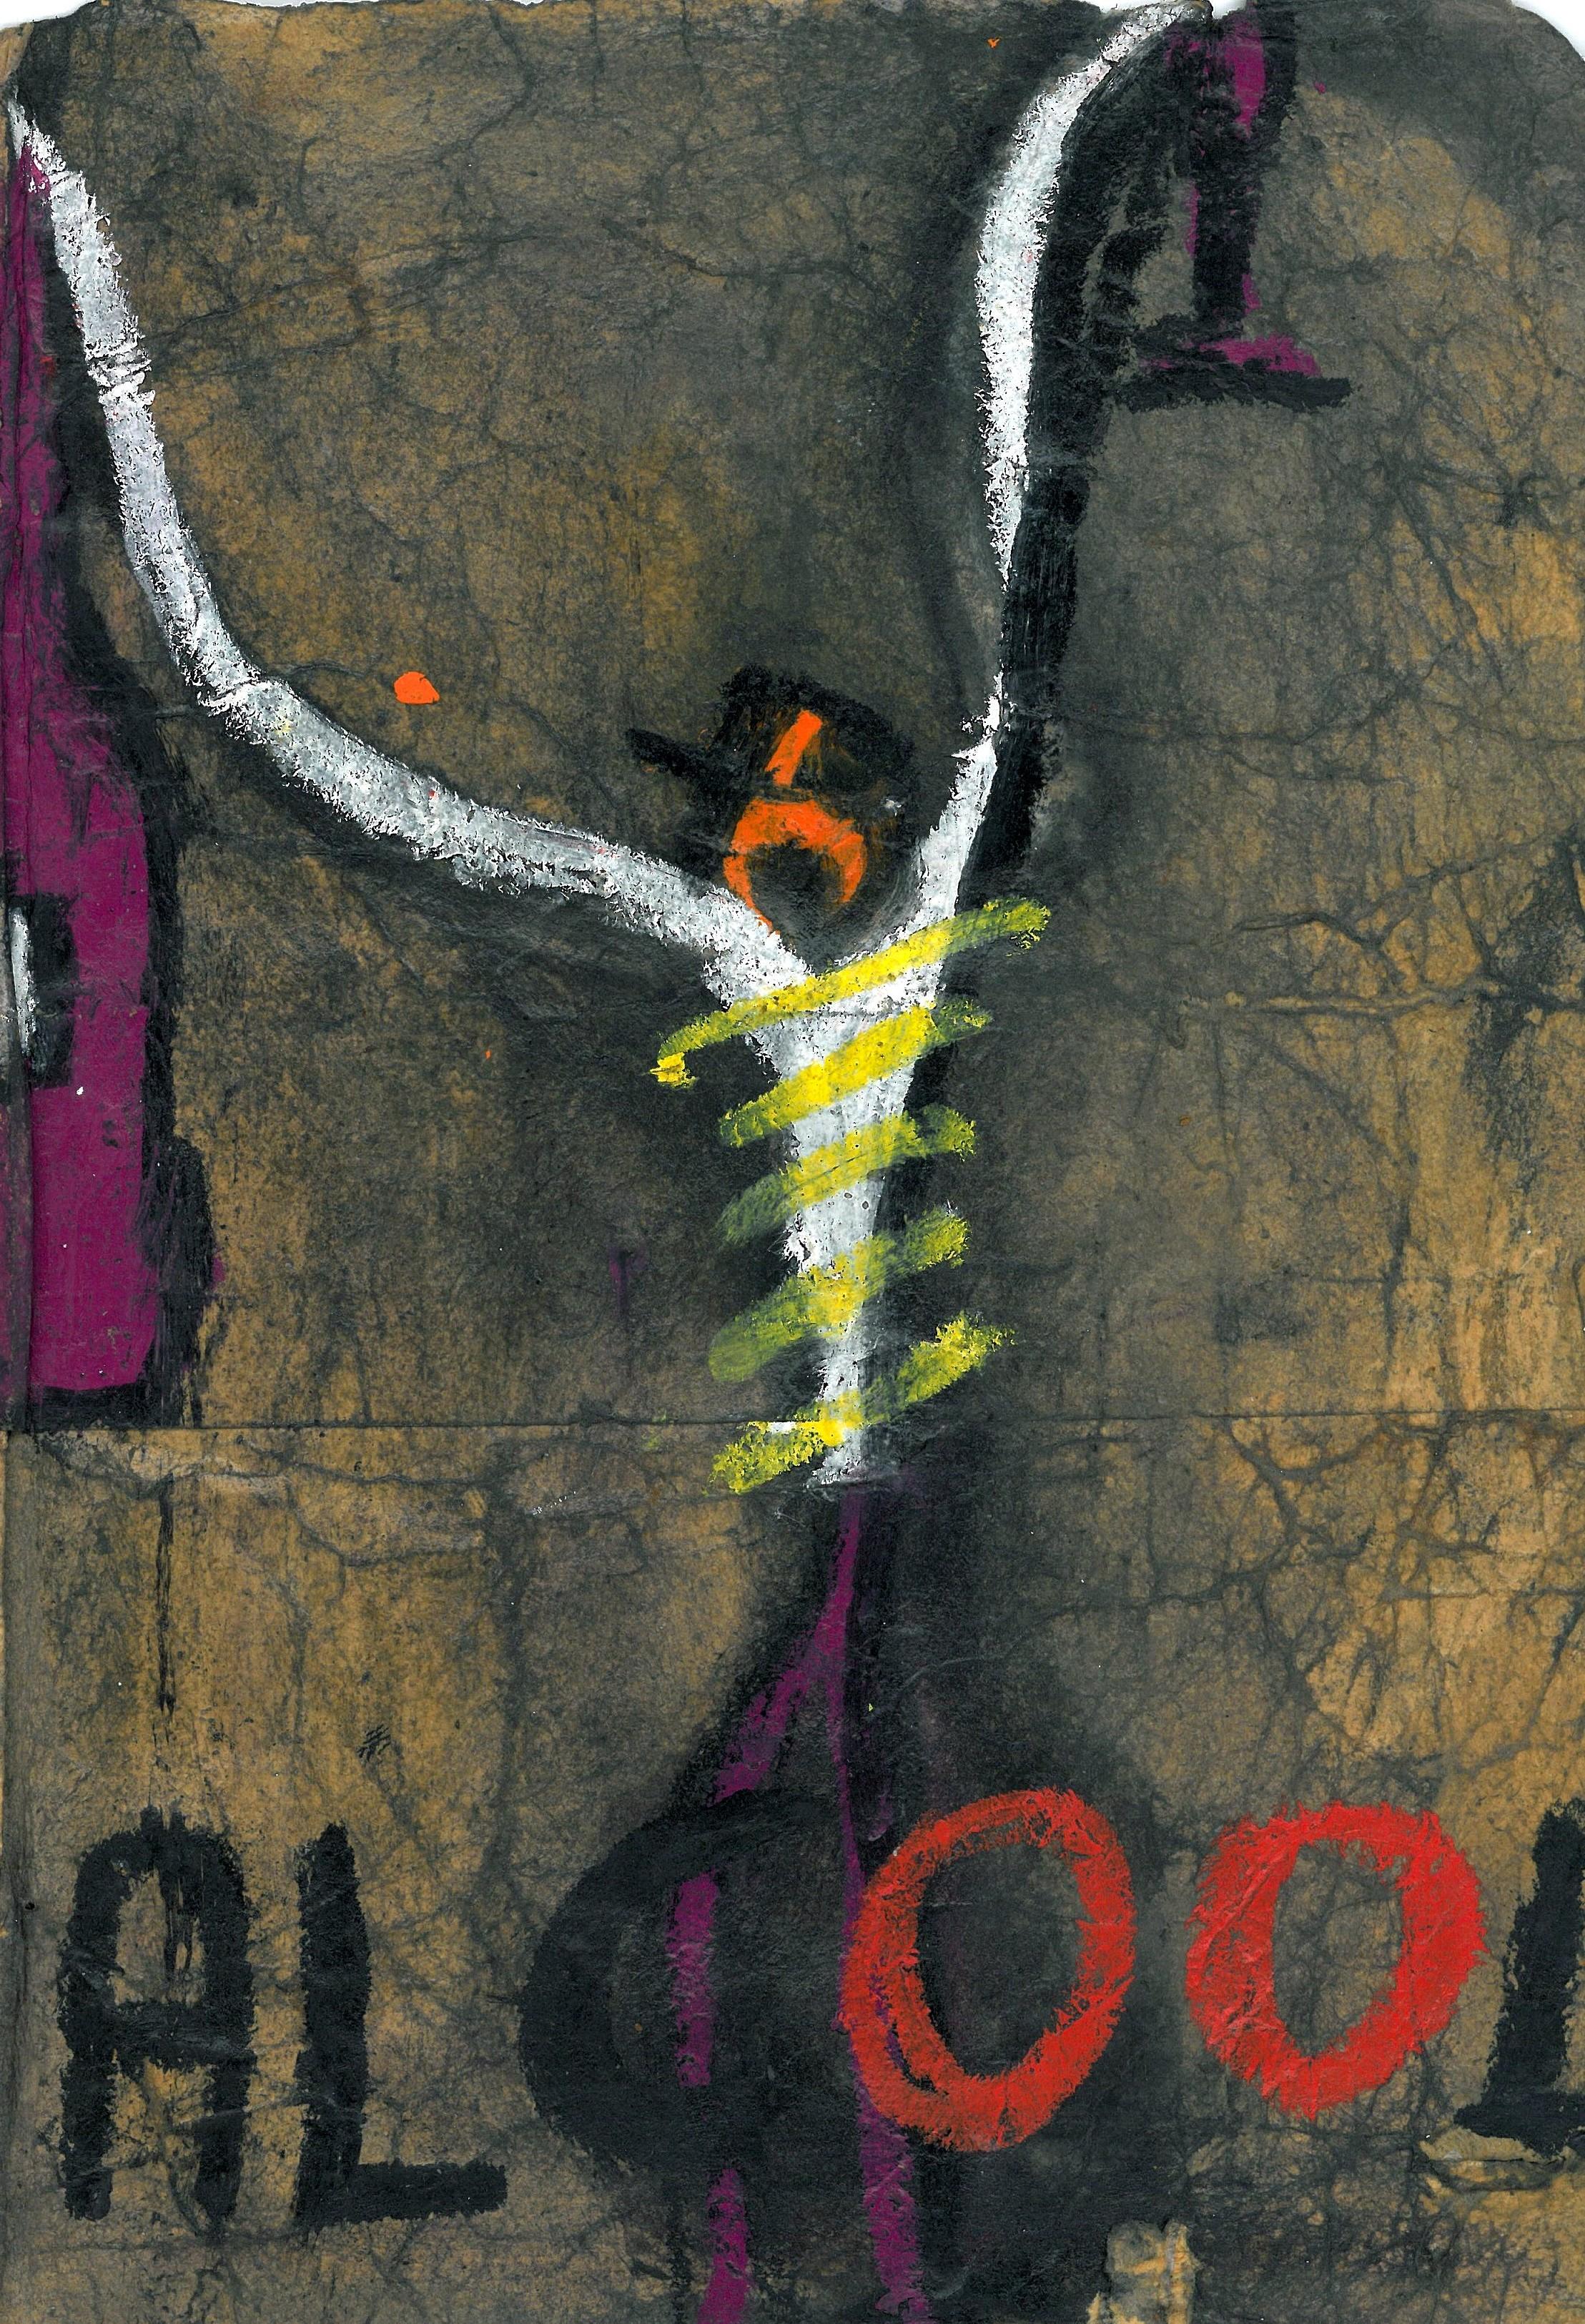 Subculture Fanzine, Ciro Casale